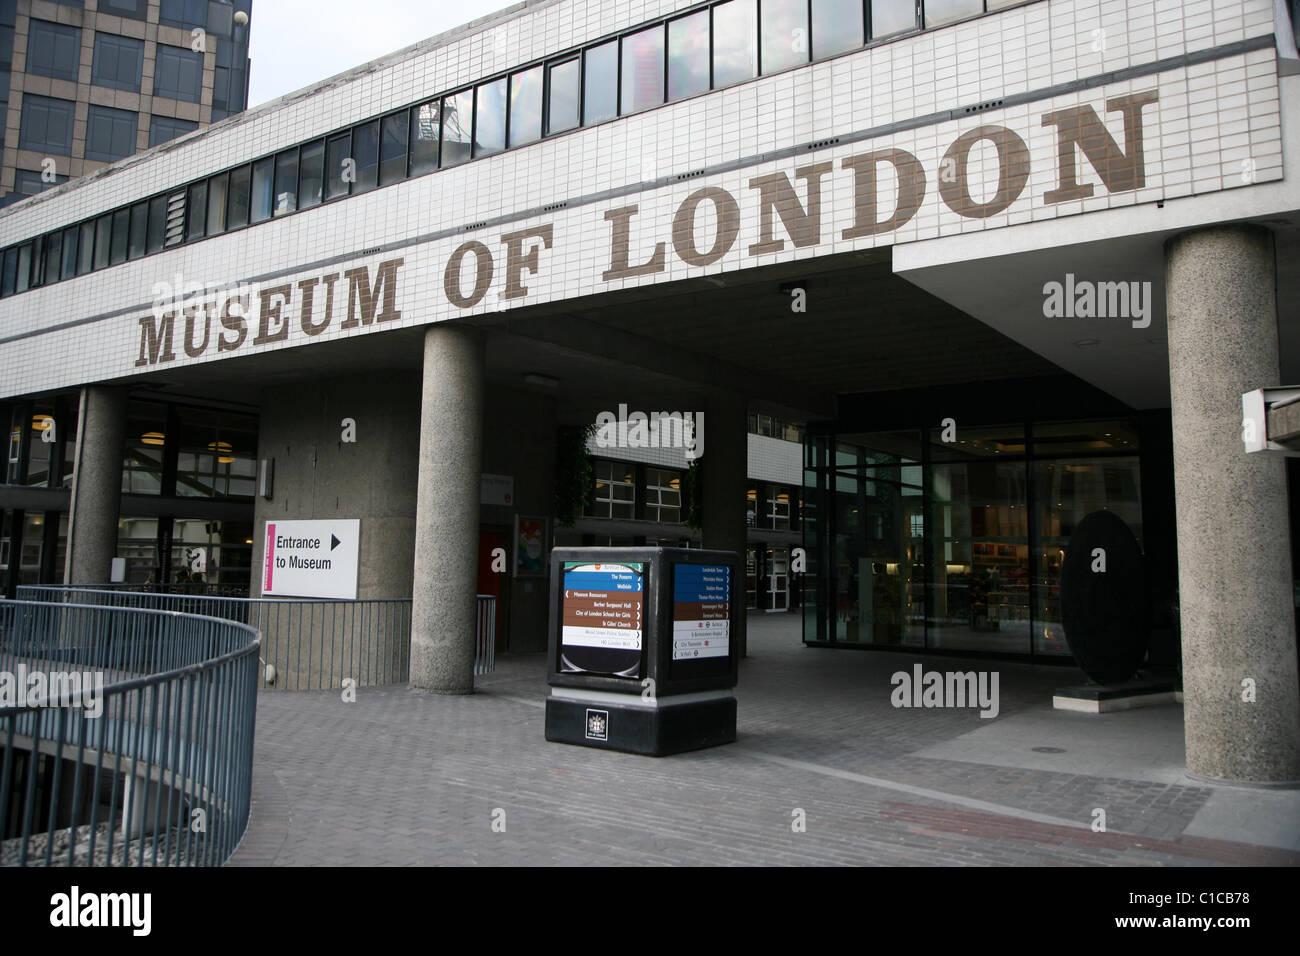 Allgemeine Ansicht Gv der Londoner Museum in London, England. Stockbild